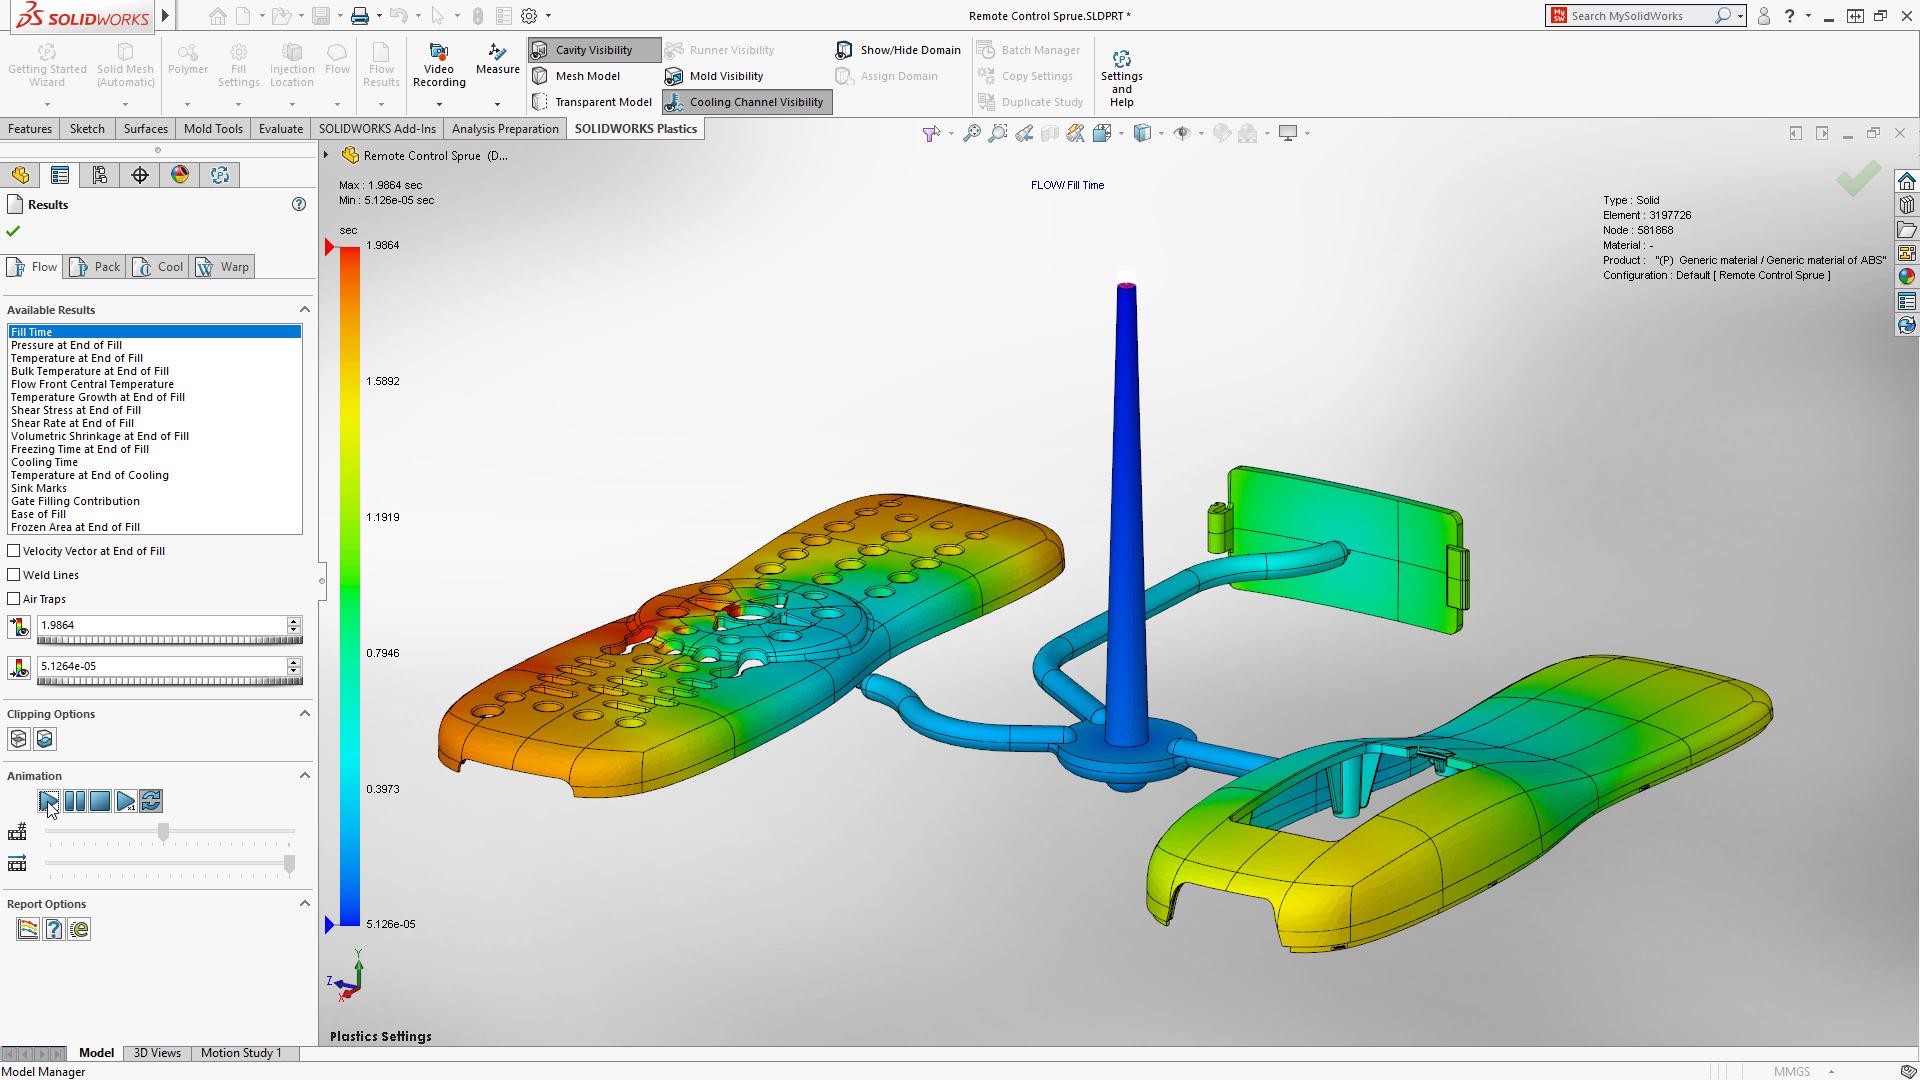 Solidworks Simulation 2018 Designer To Analyst